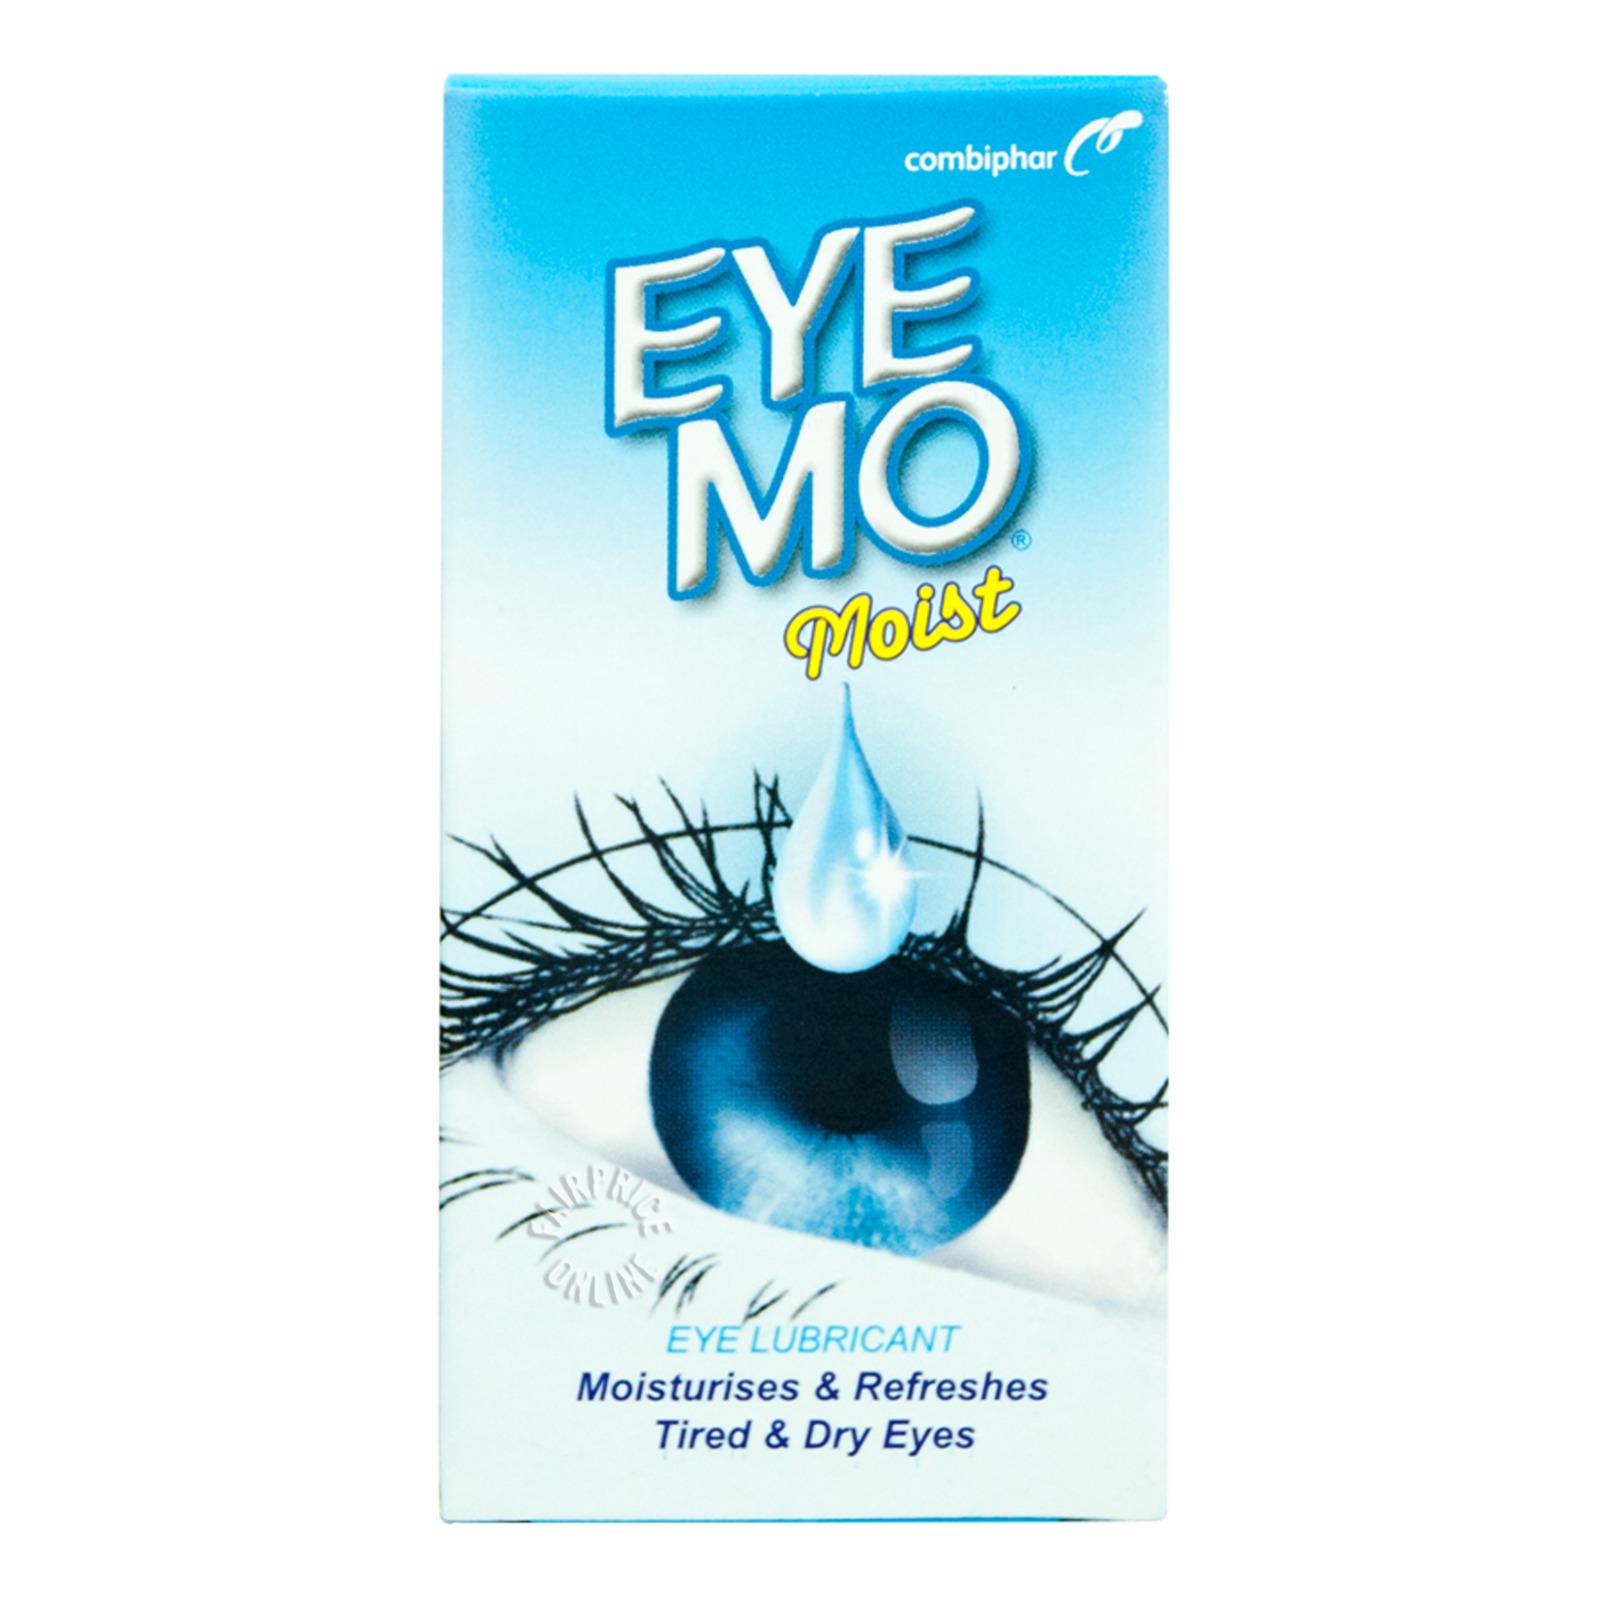 Eye Mo Eye Lubricant - Moist